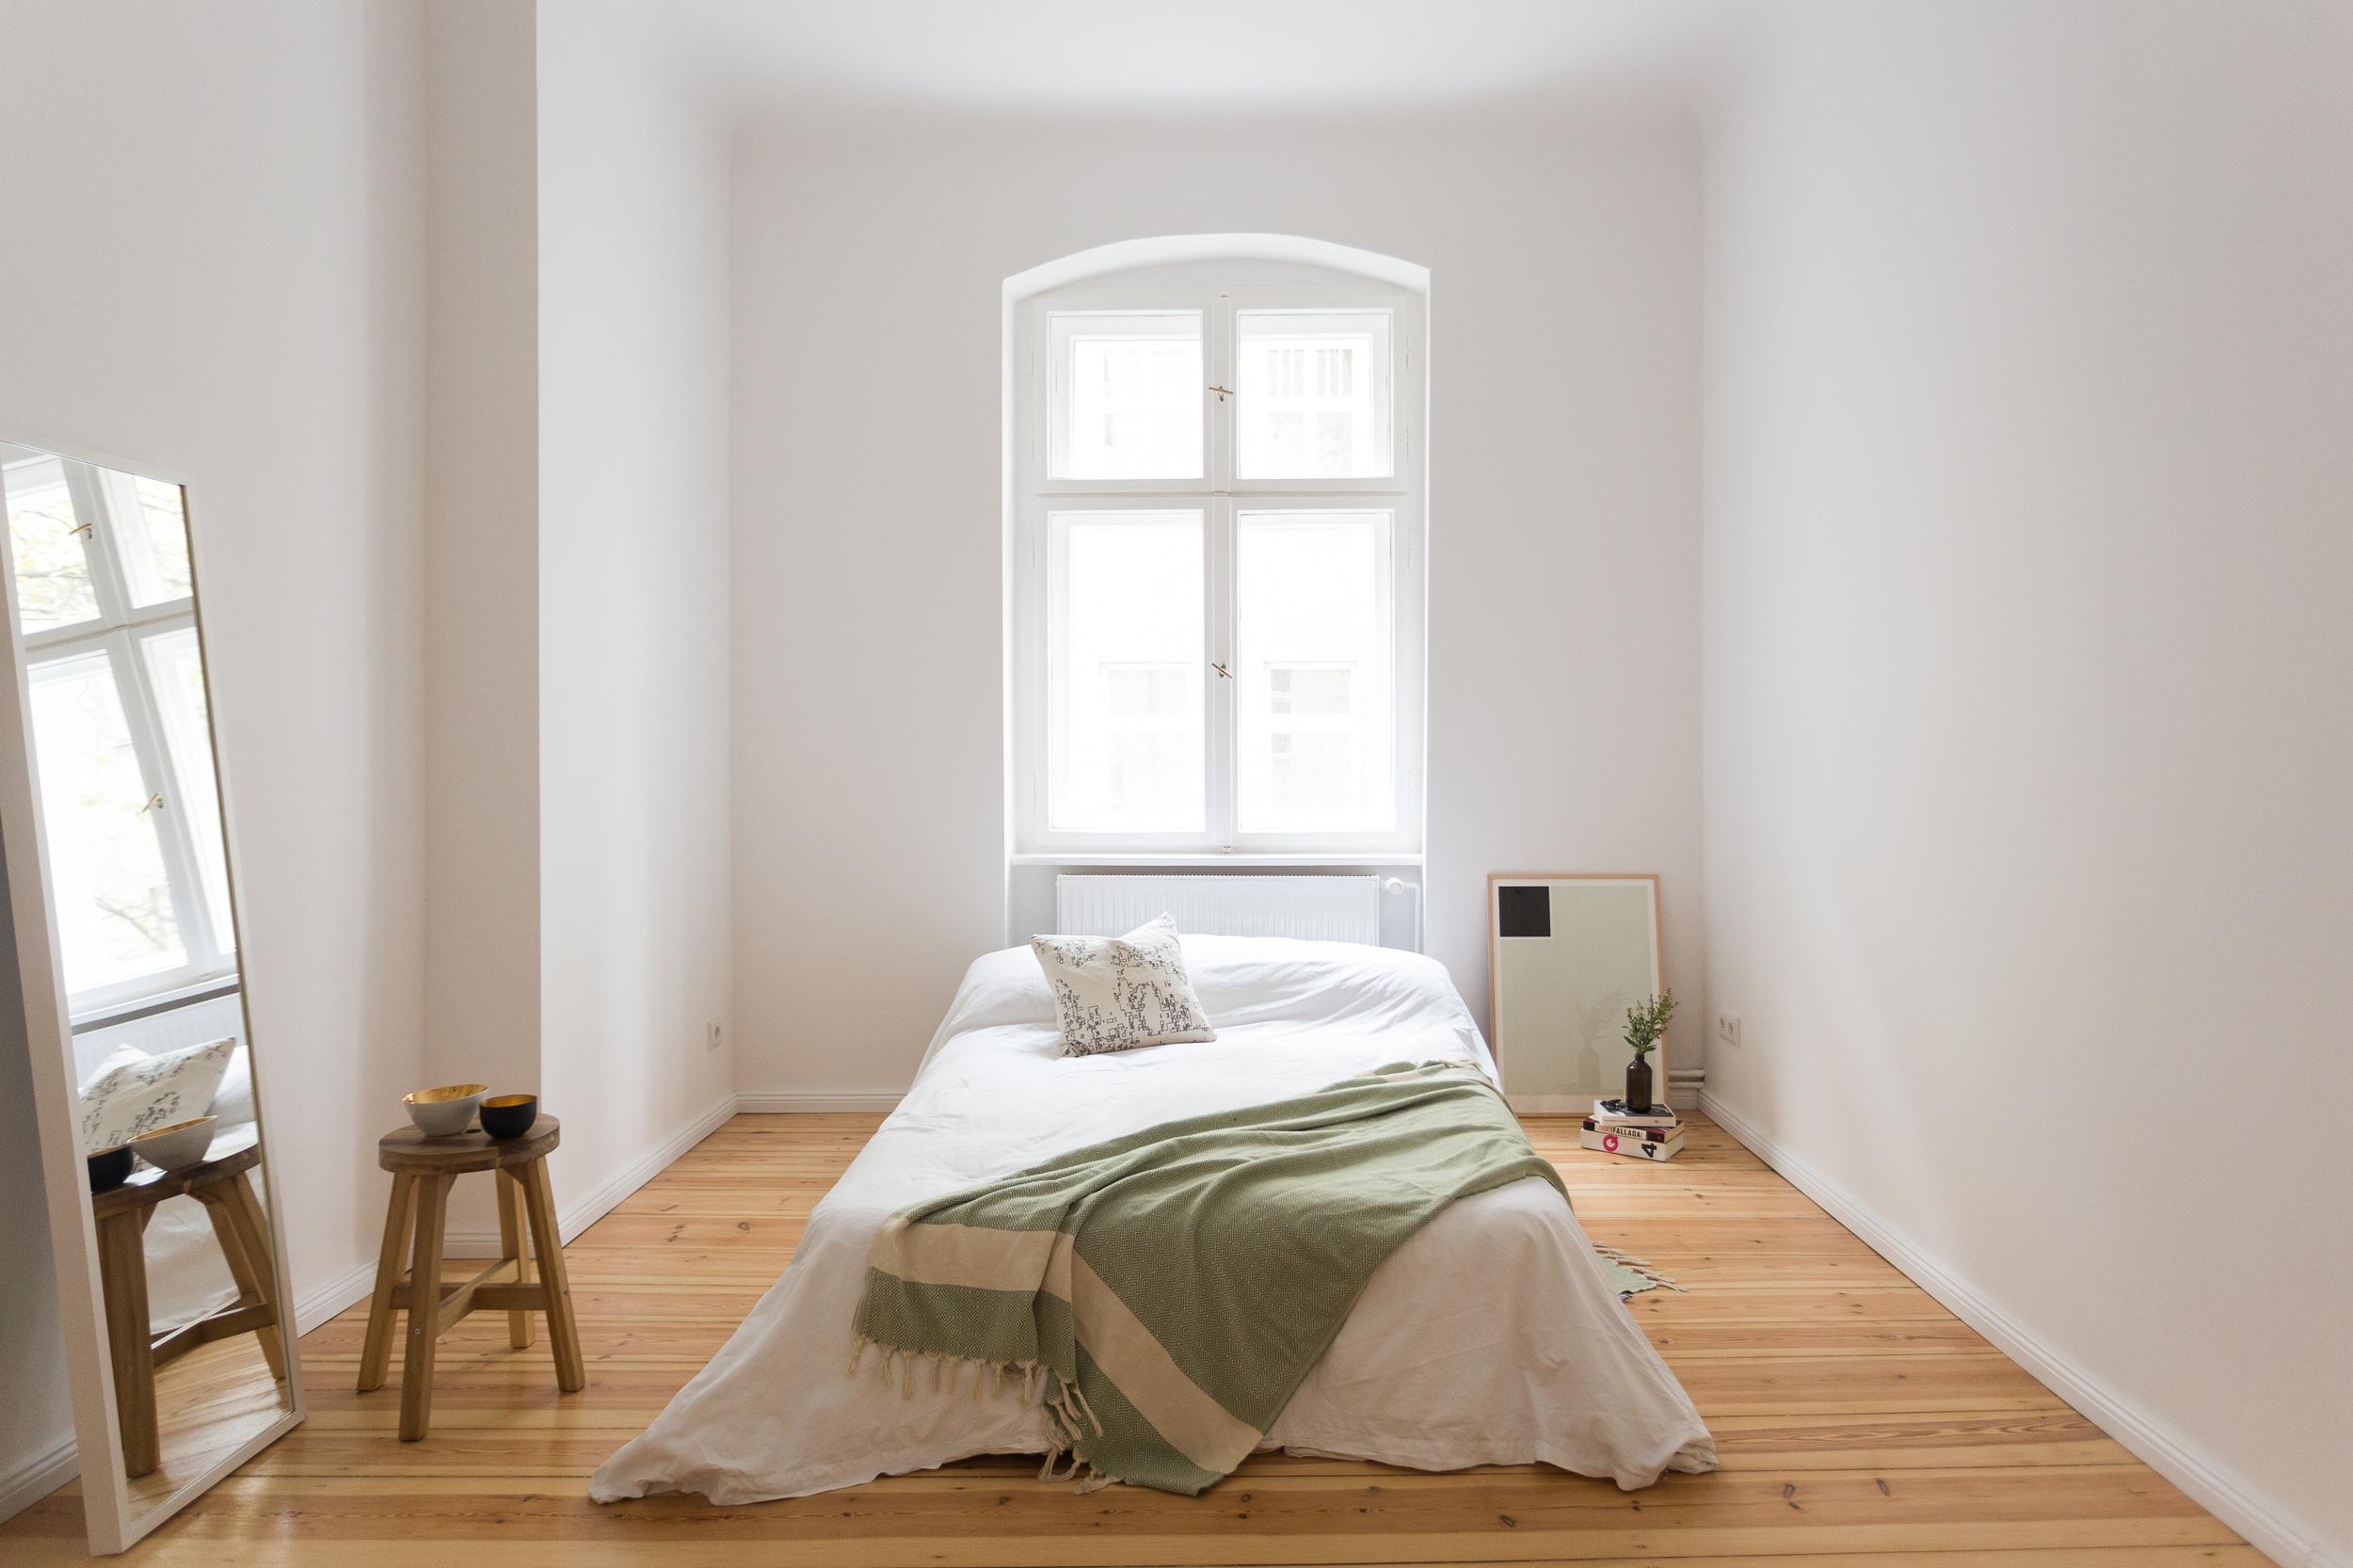 Schoeneberg_Berlin-toitoitoi-creative_studio_bedroom.jpg